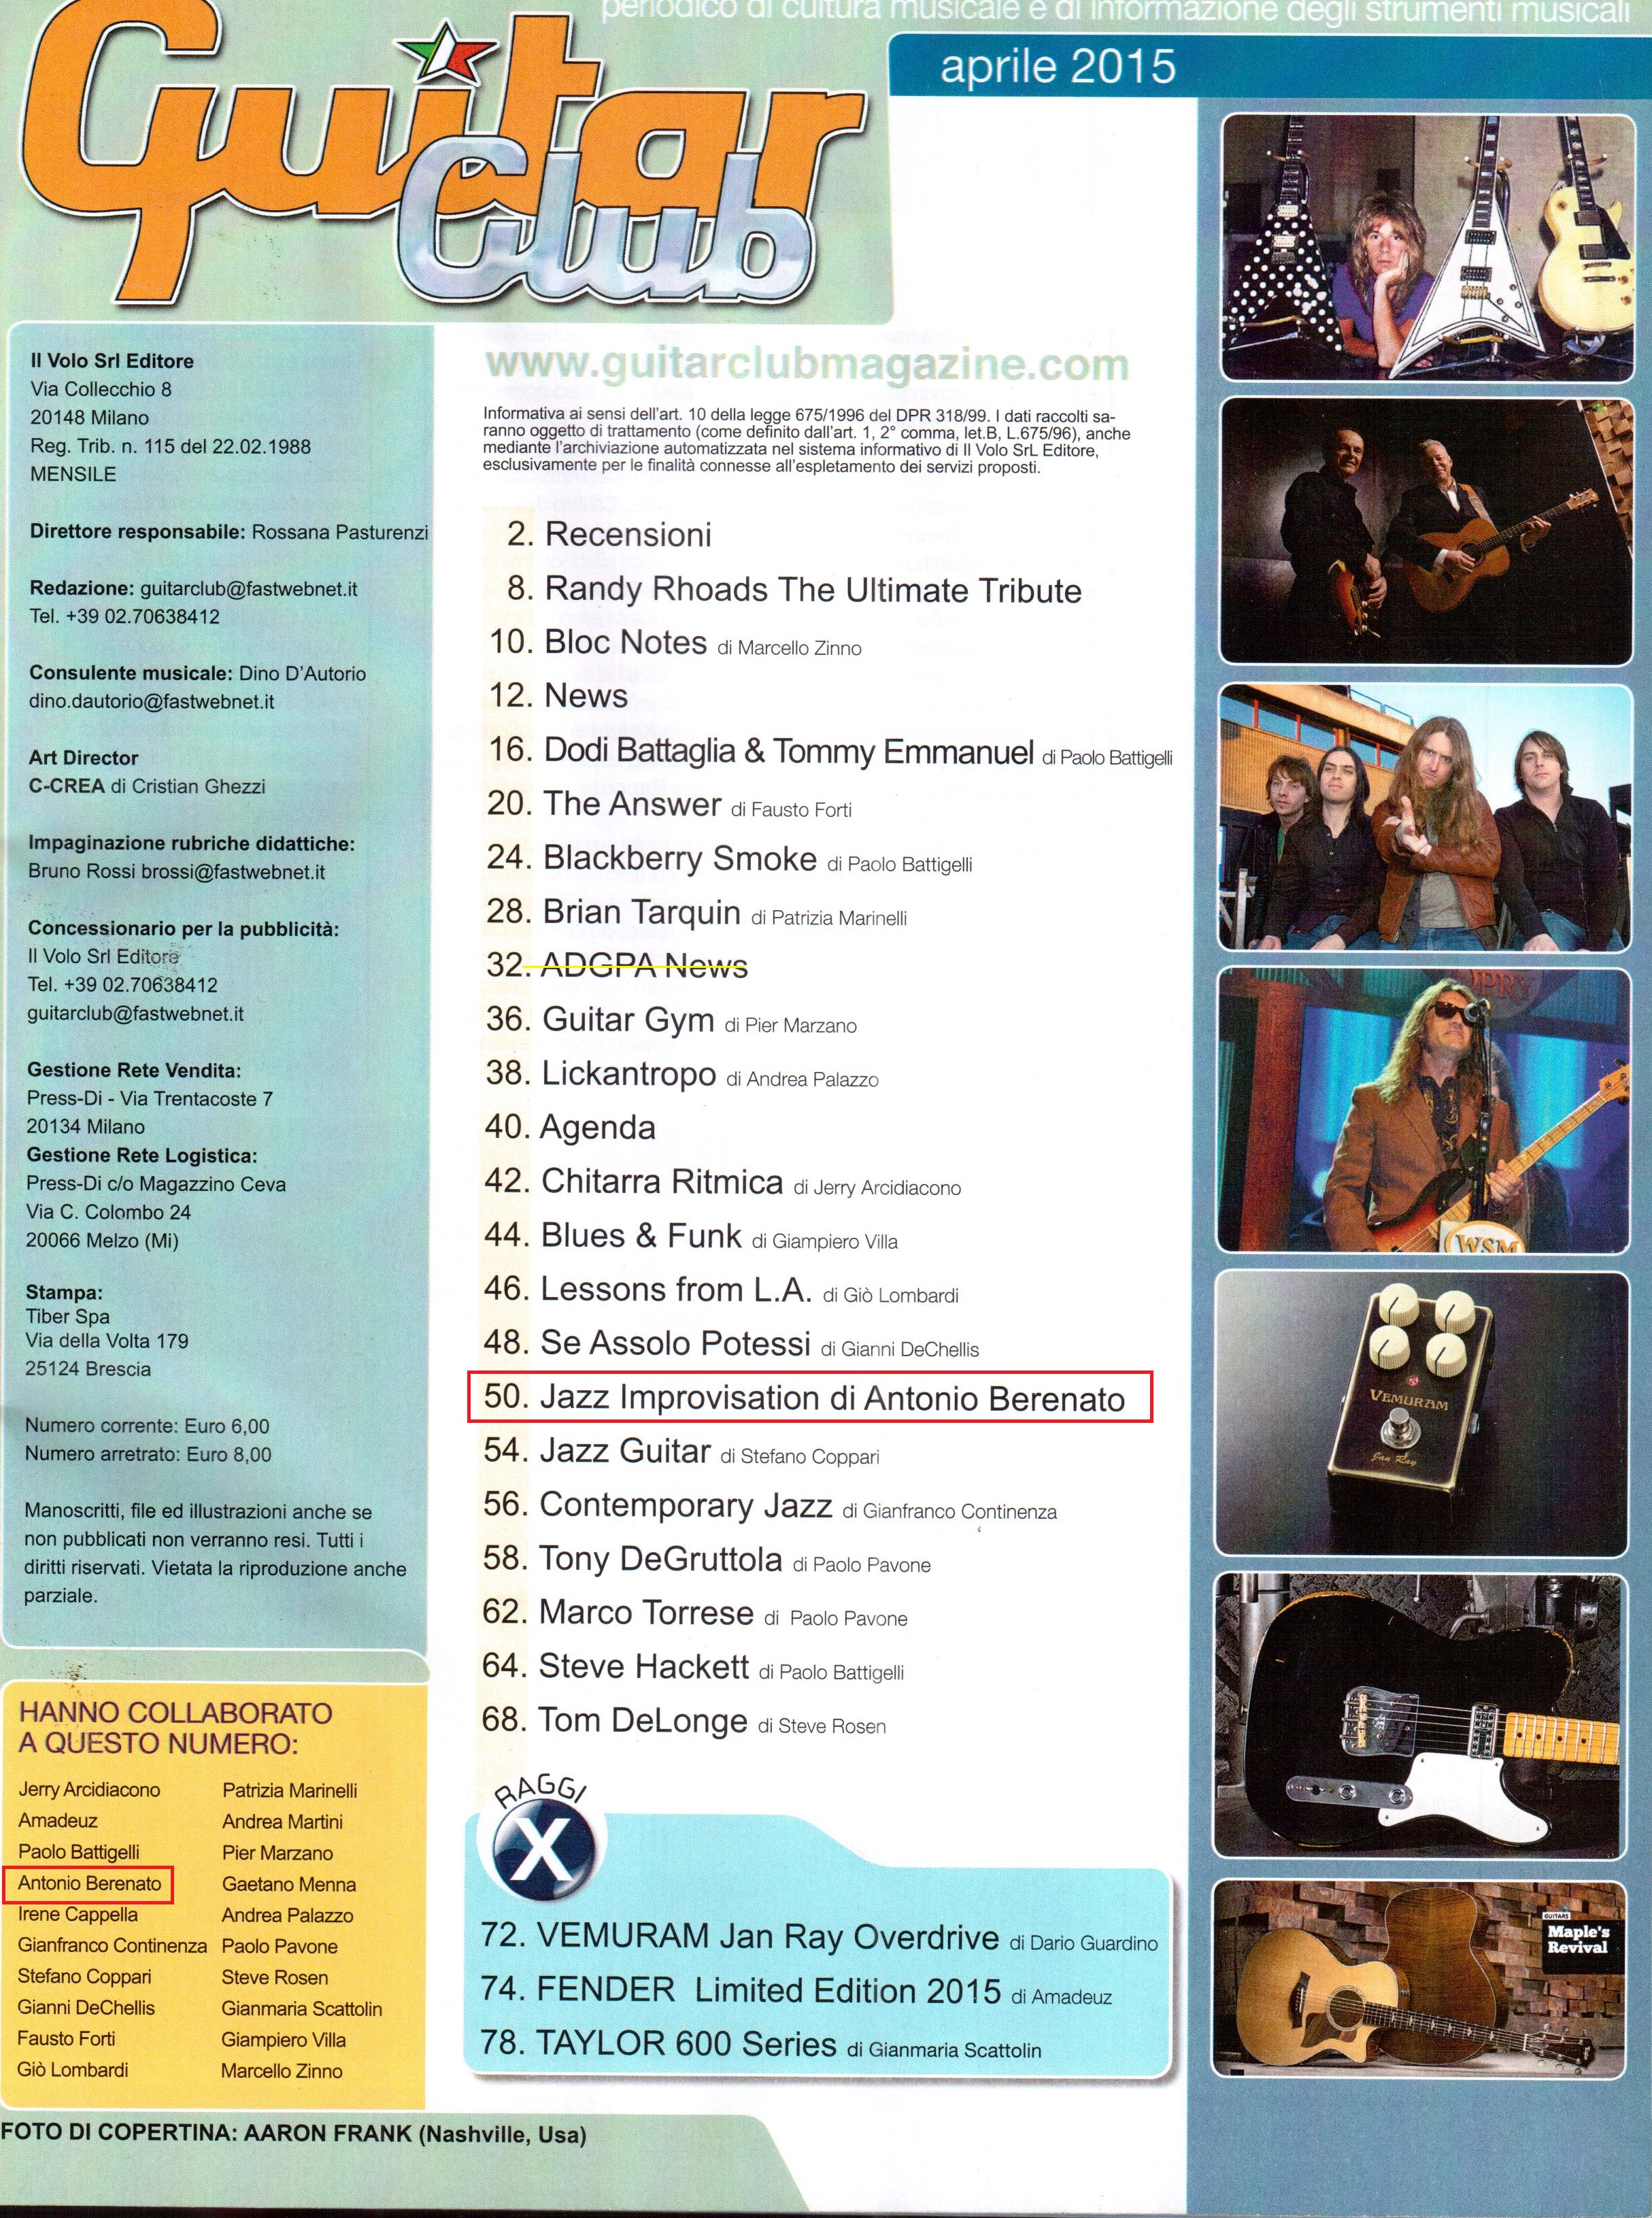 Index Guitar Club Aprile 2015 .jpg